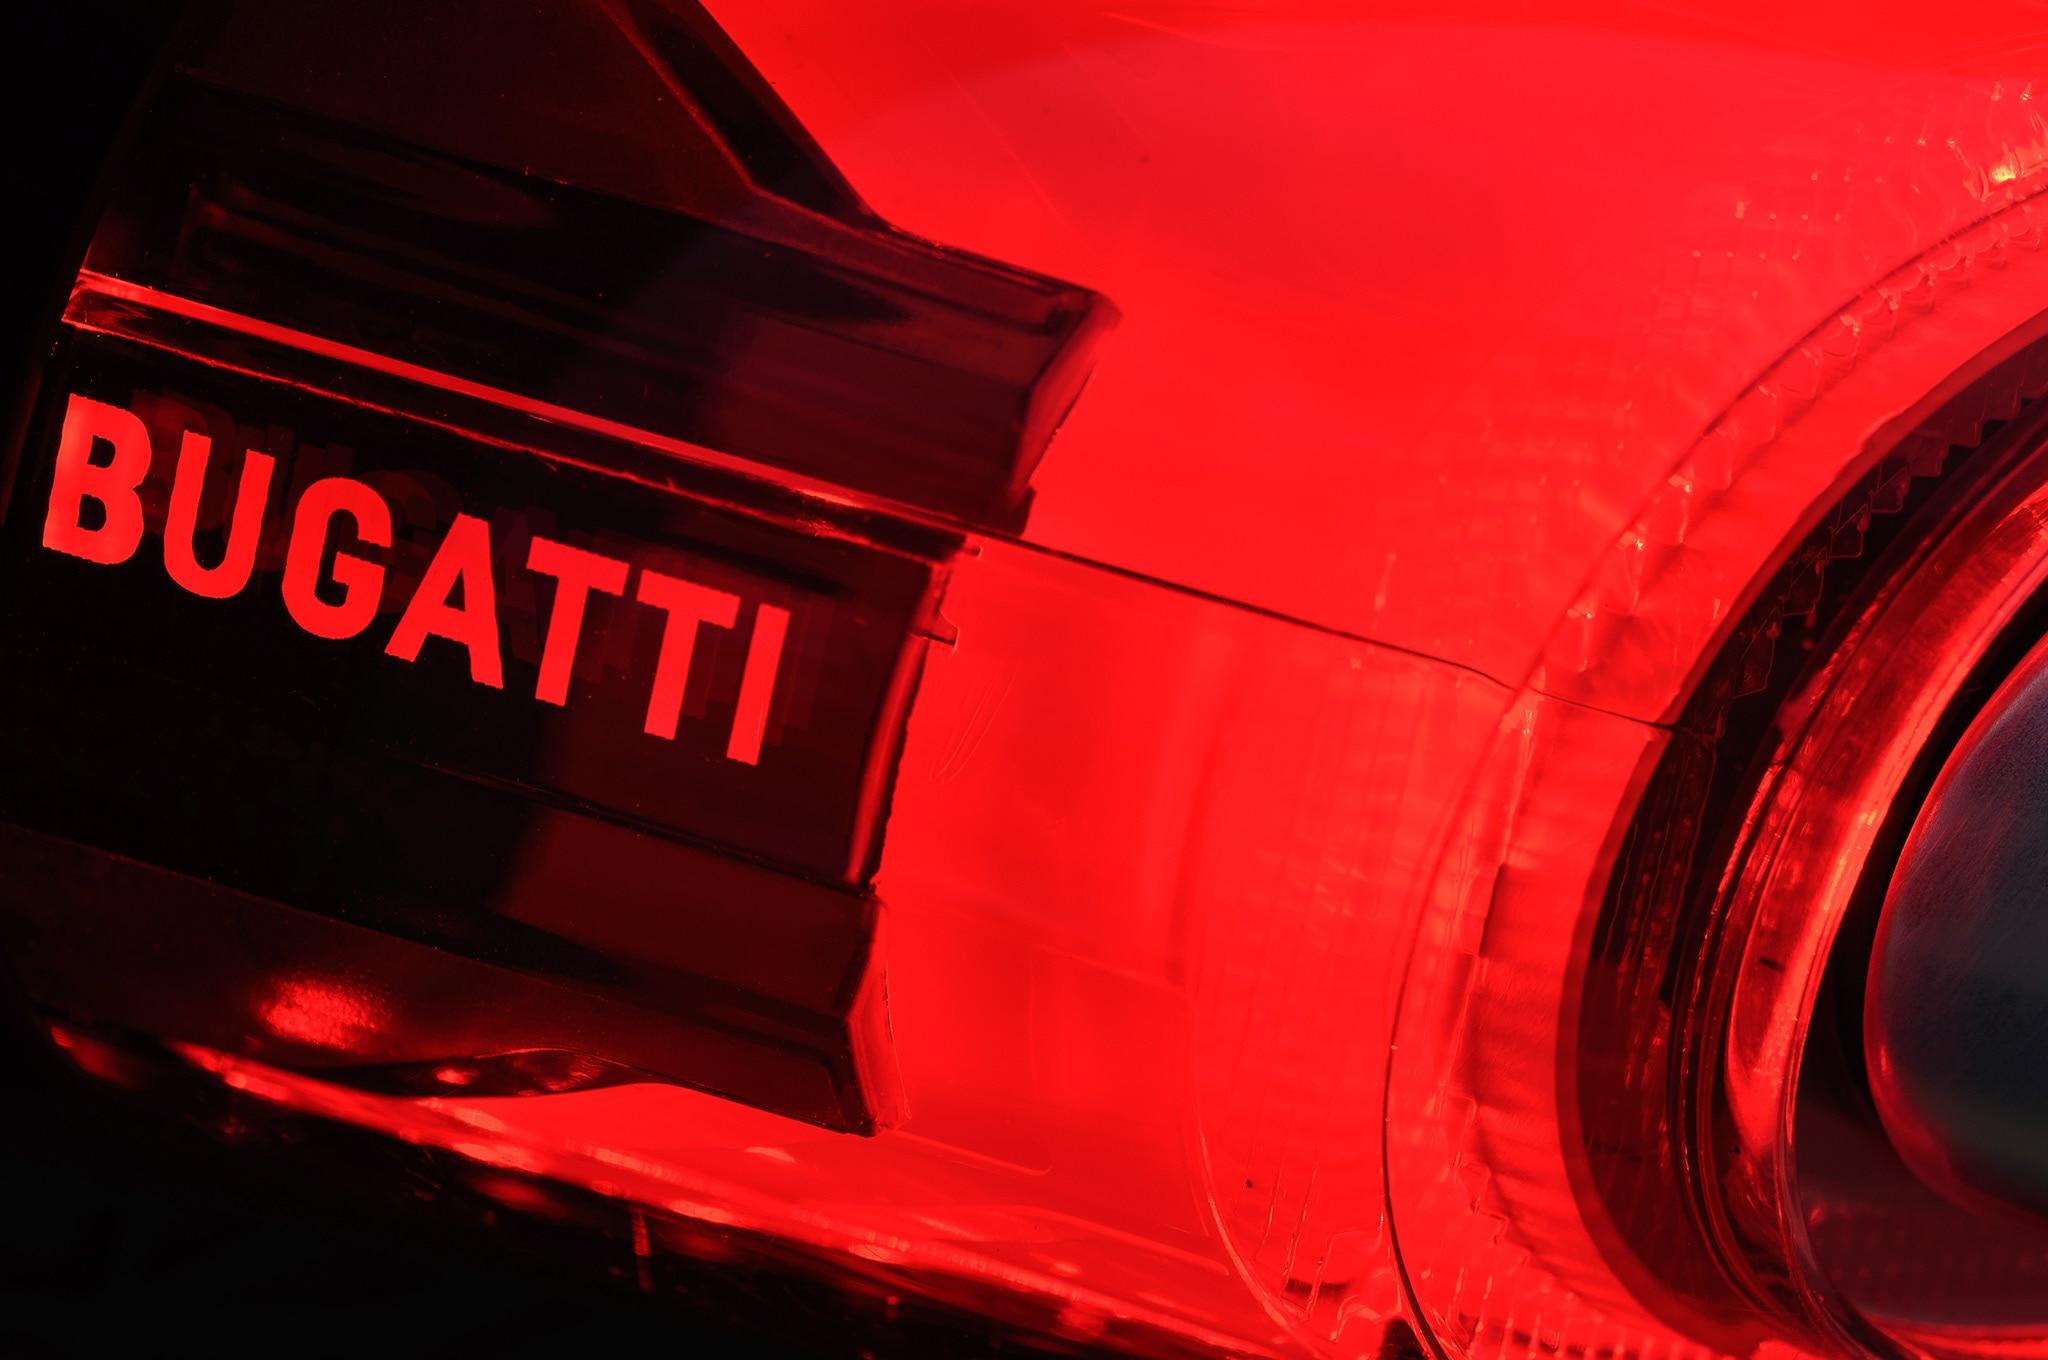 2018 bugatti red.  bugatti show more in 2018 bugatti red